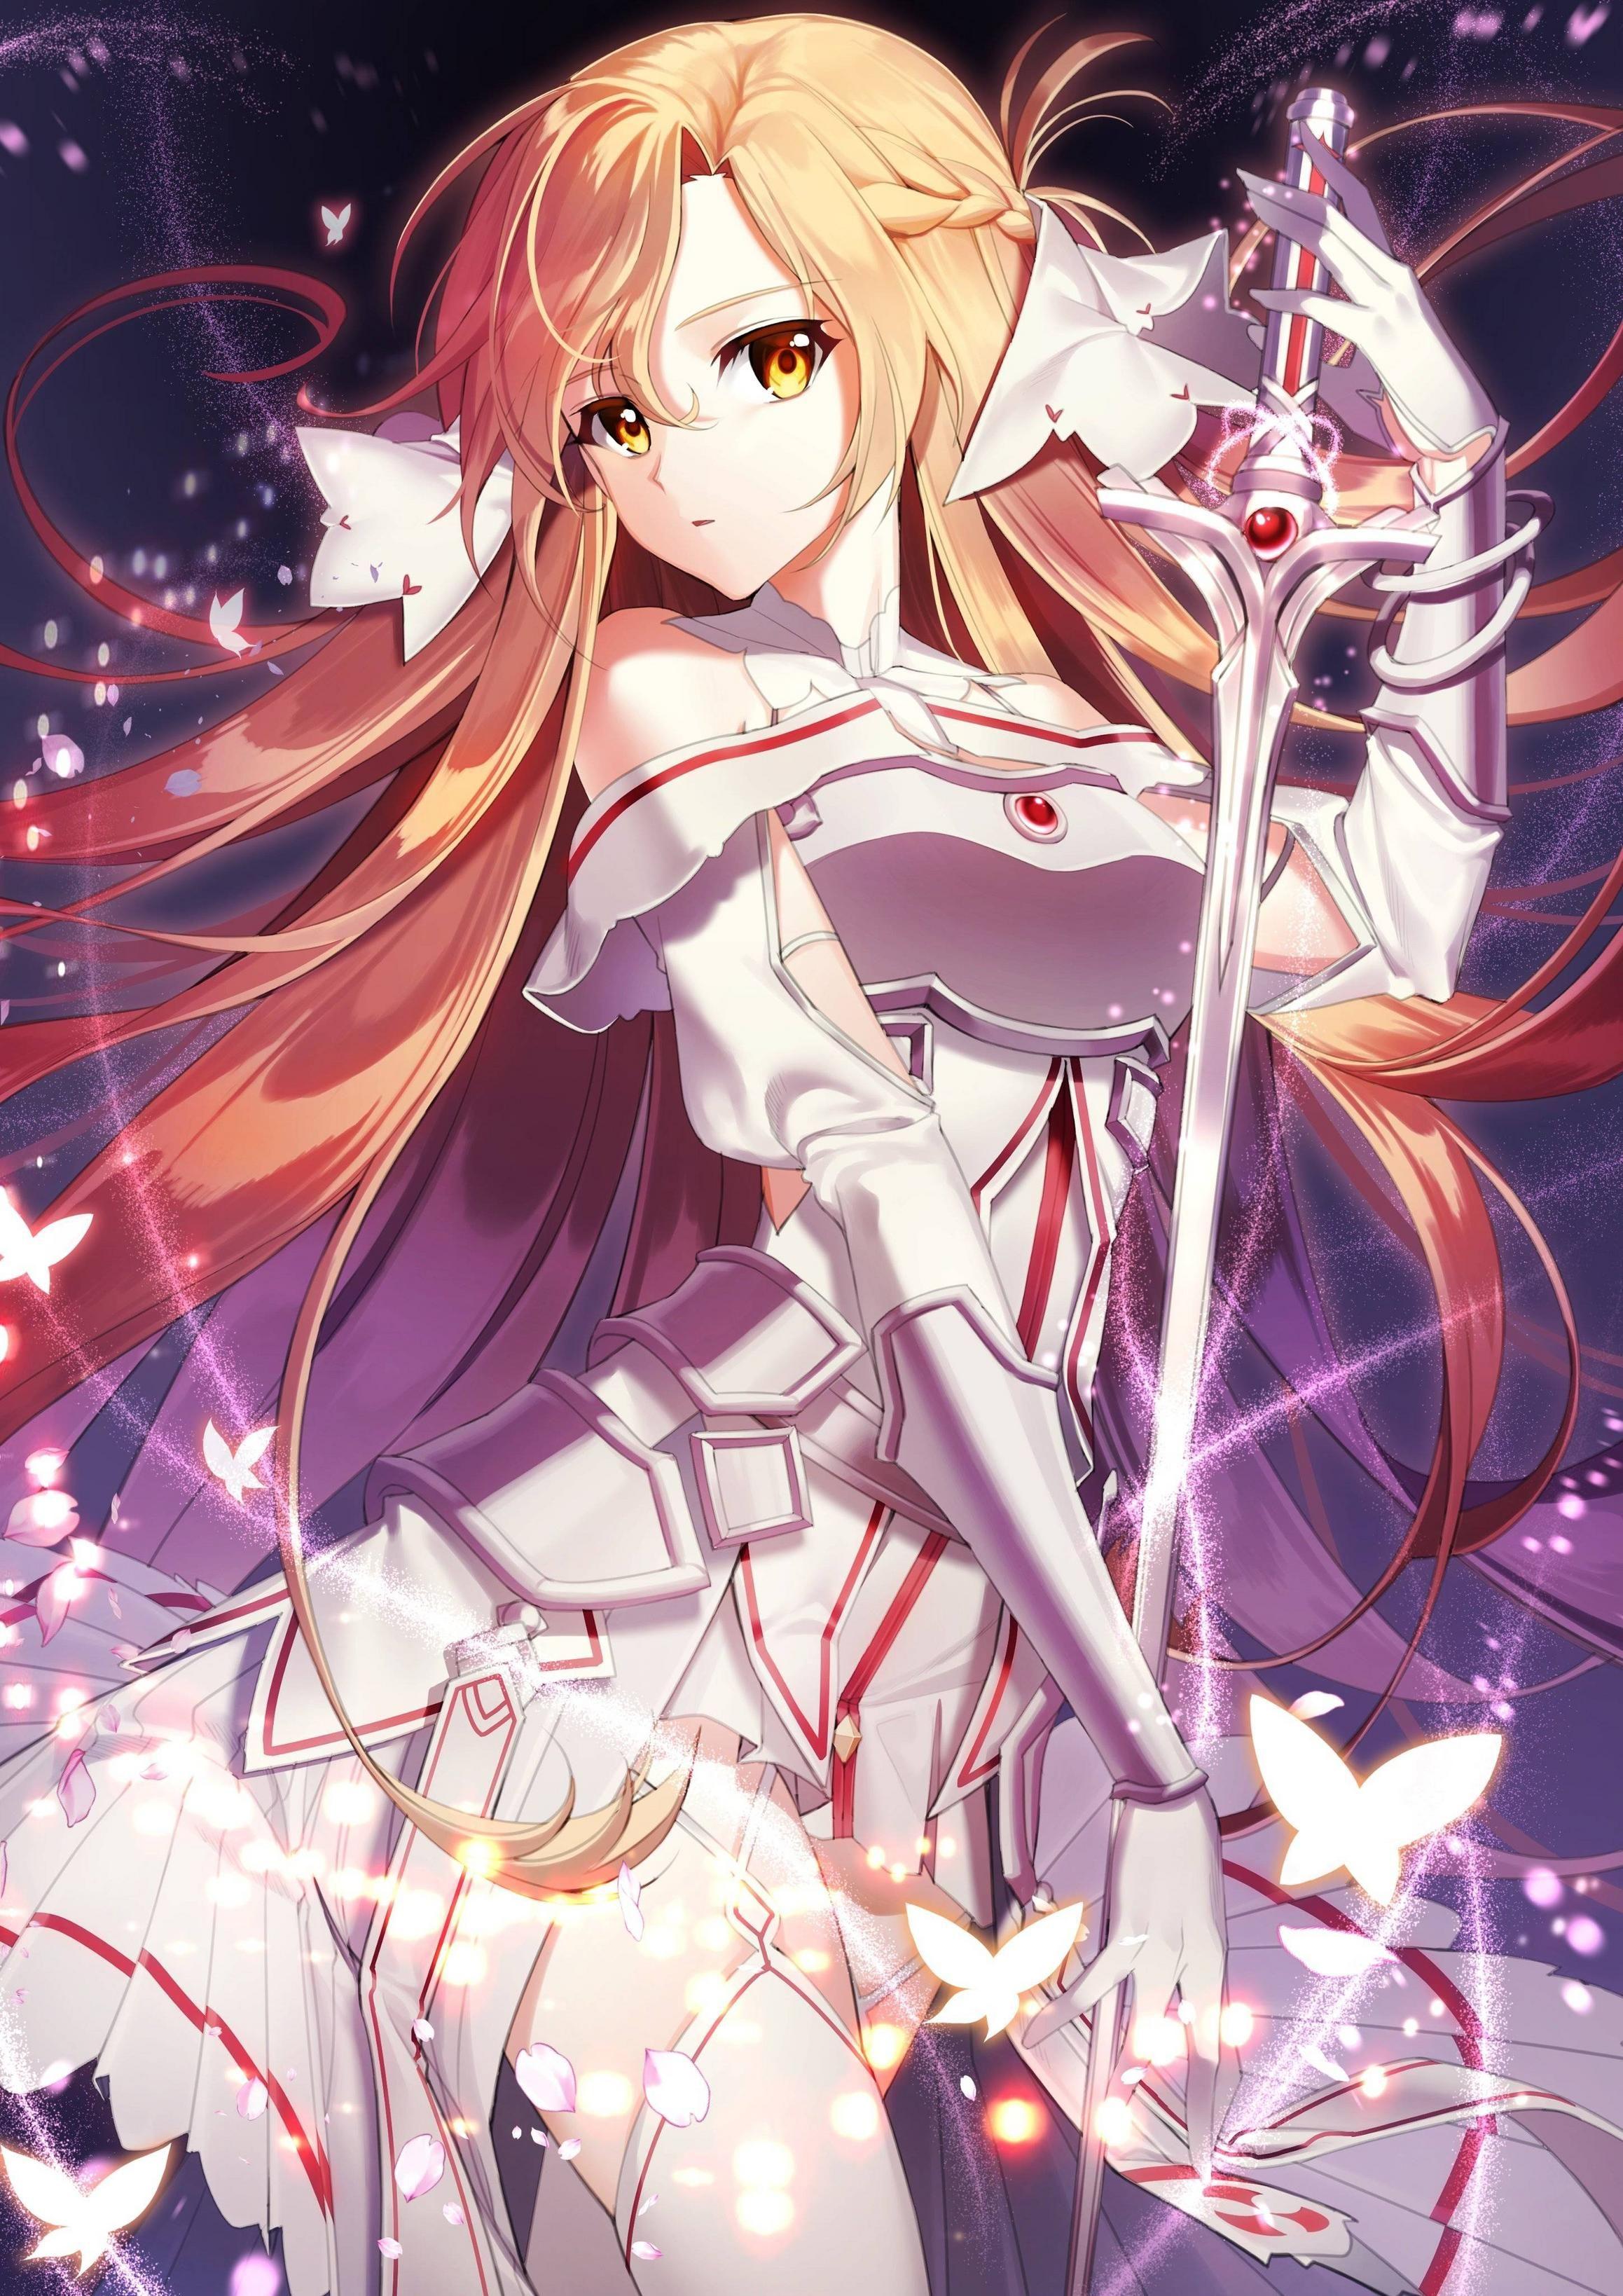 Asuna [Sword Art Online] - Follow our pinterest for daily pins